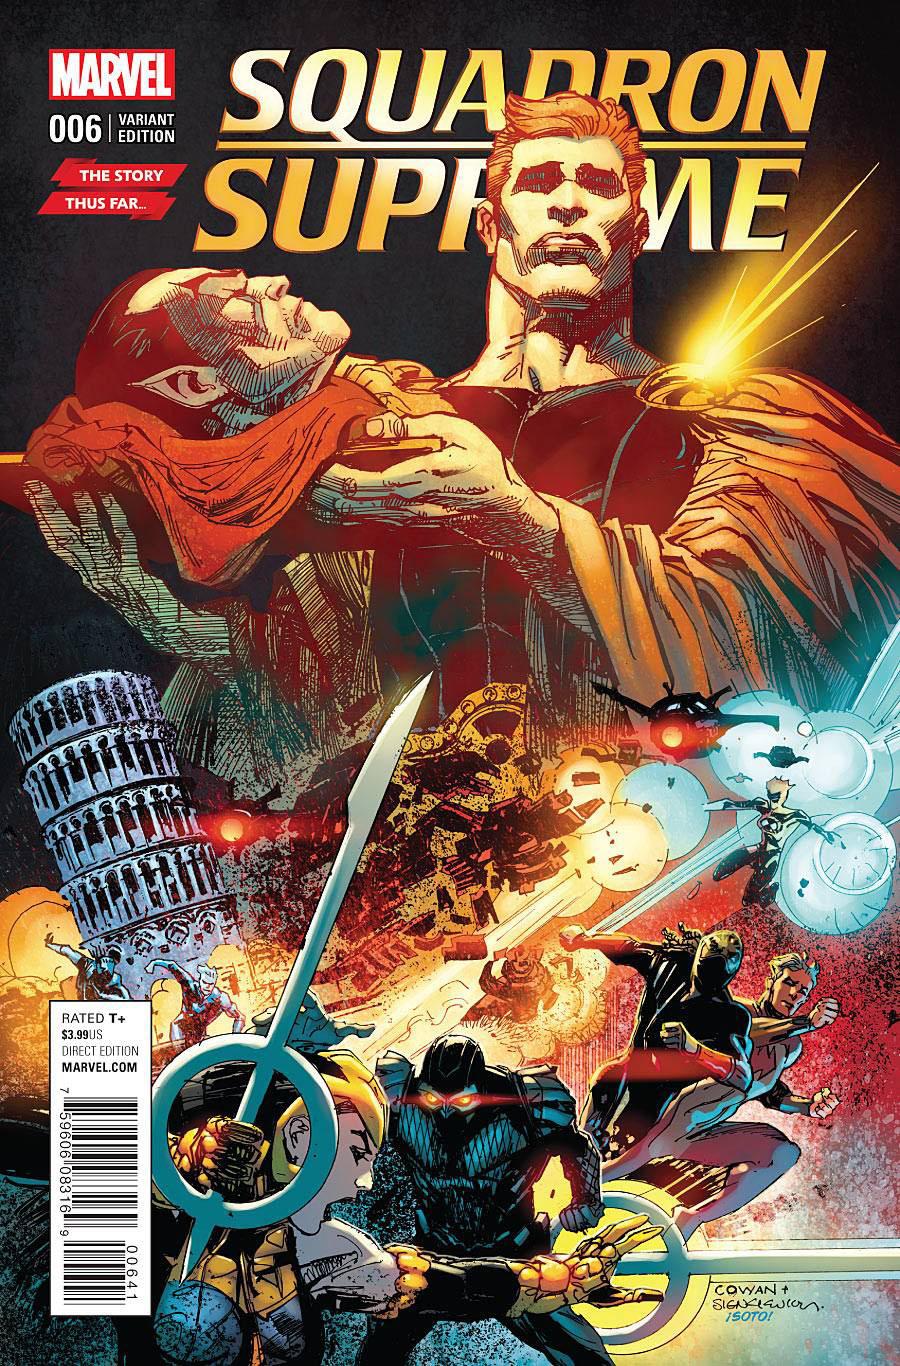 Squadron Supreme Vol 4 #6 Cover B Variant Story Thus Far Cover